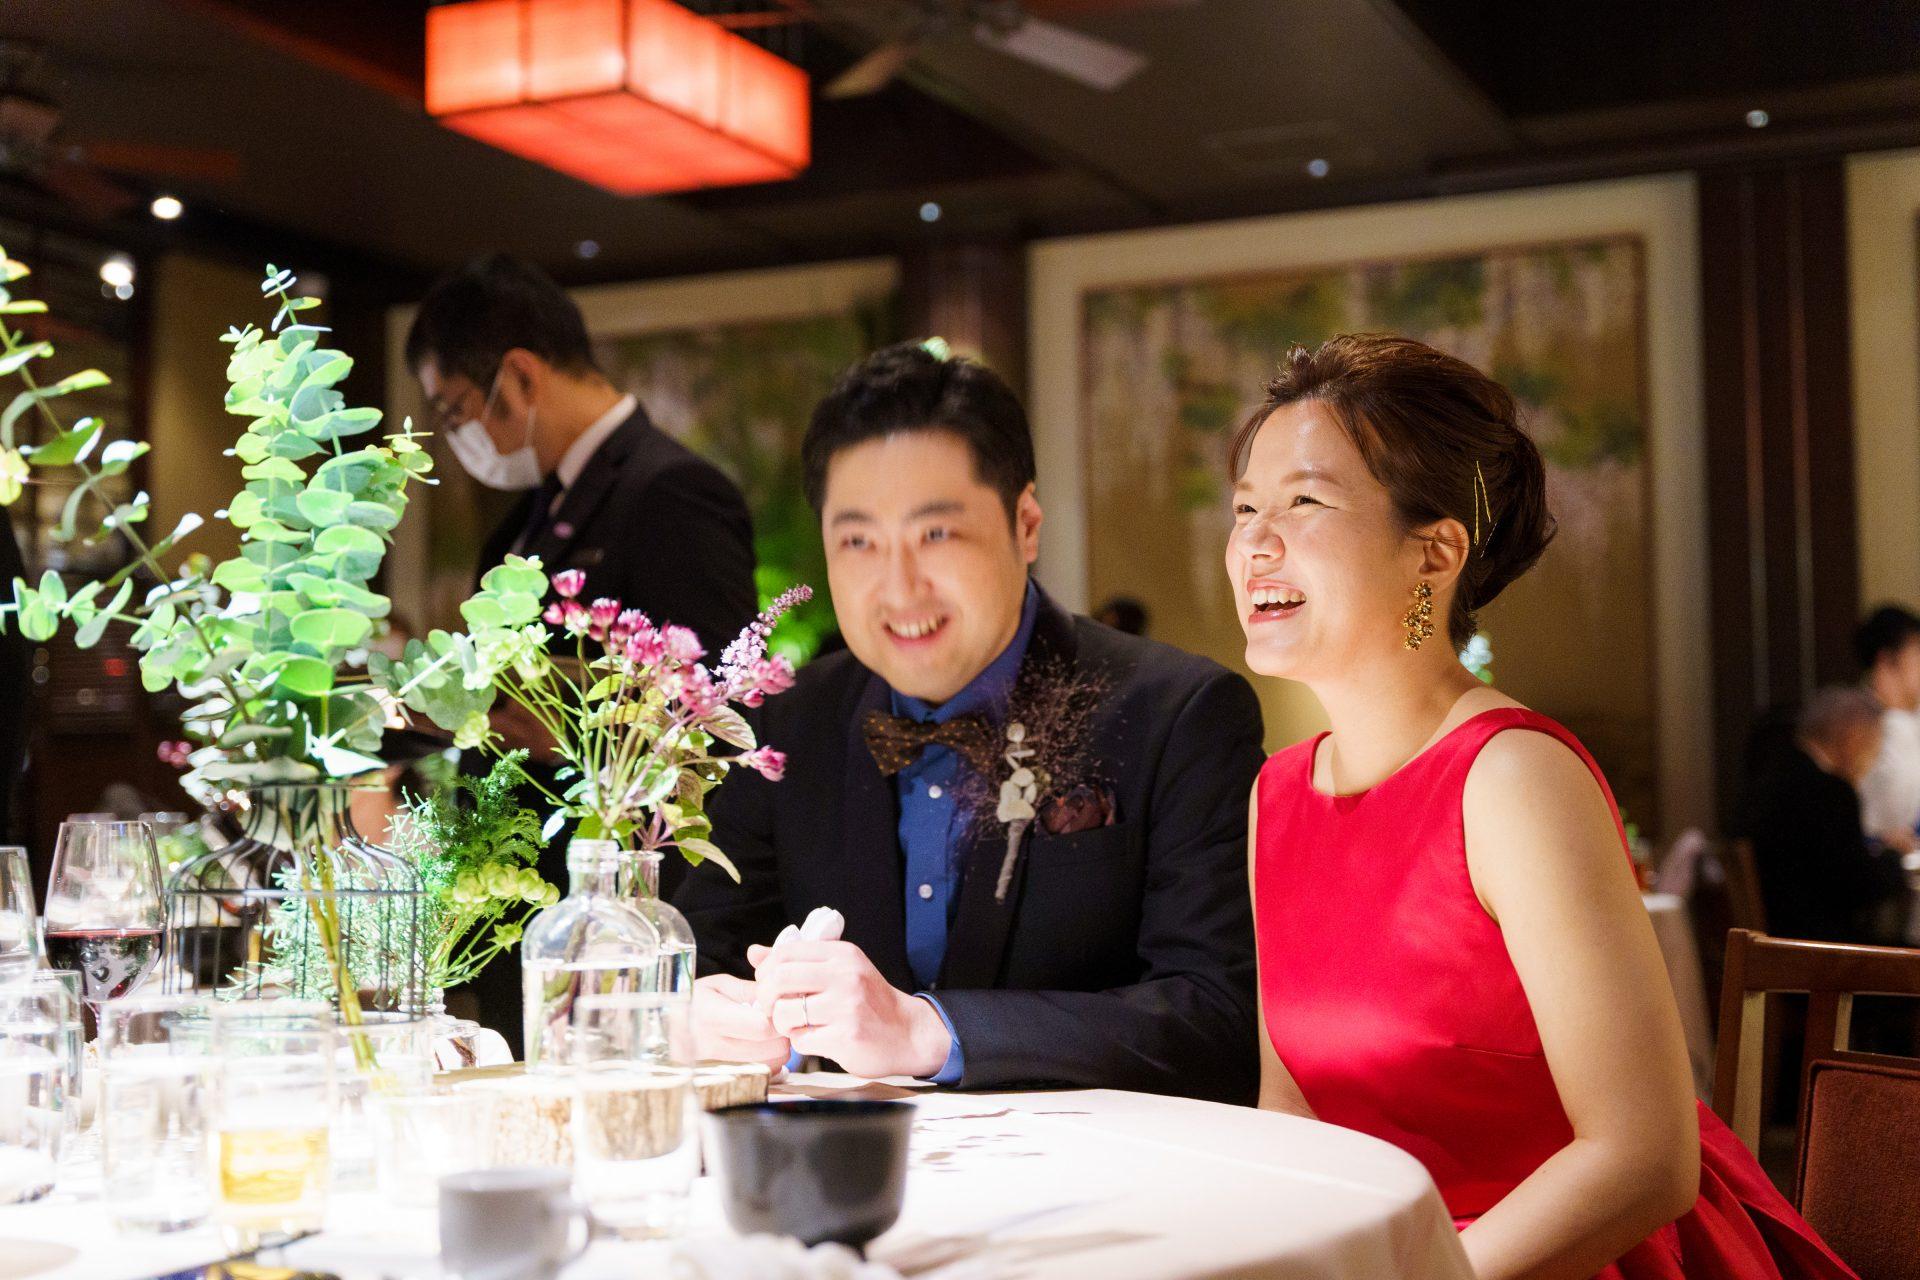 THE TREAT DRESSINGで人気の赤いカラードレスを身に纏いゲストと楽しい時間を過ごすご新婦様